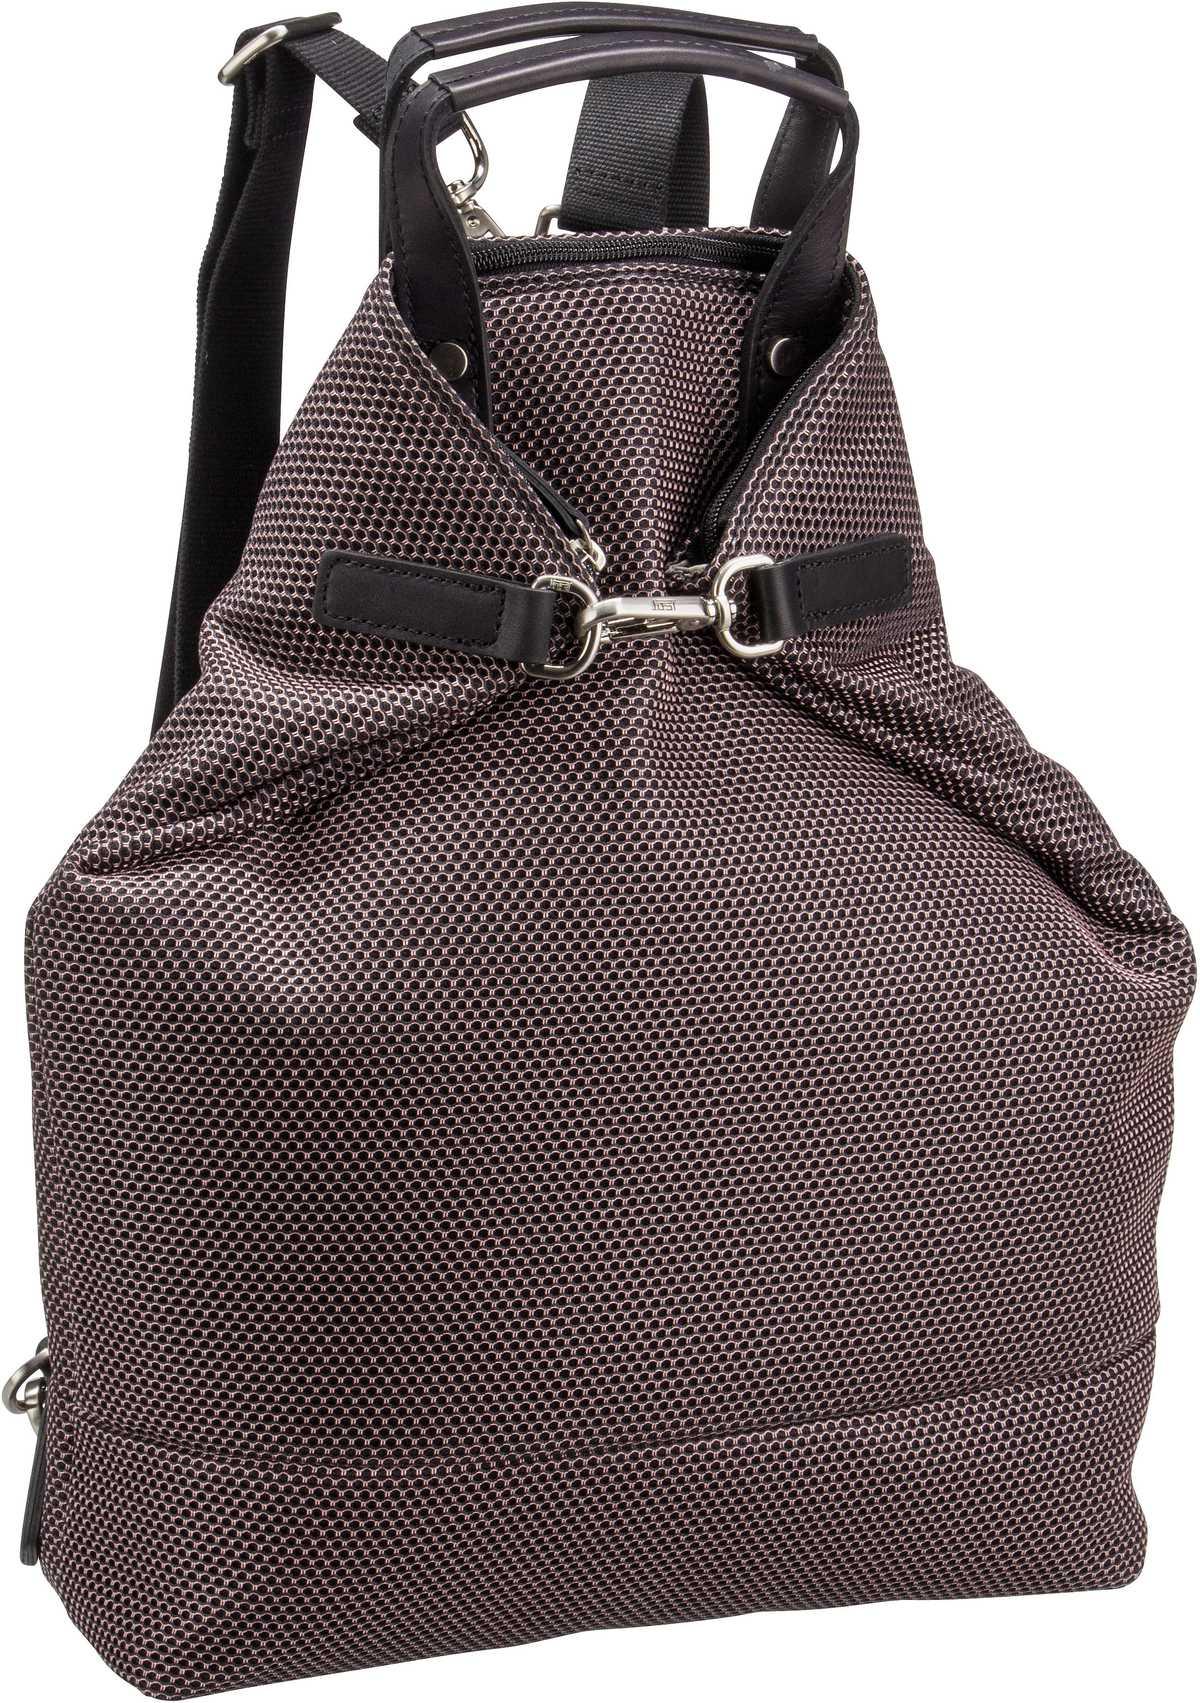 Rucksack / Daypack Mesh 6178 X-Change 3in1 Bag S Rosewood